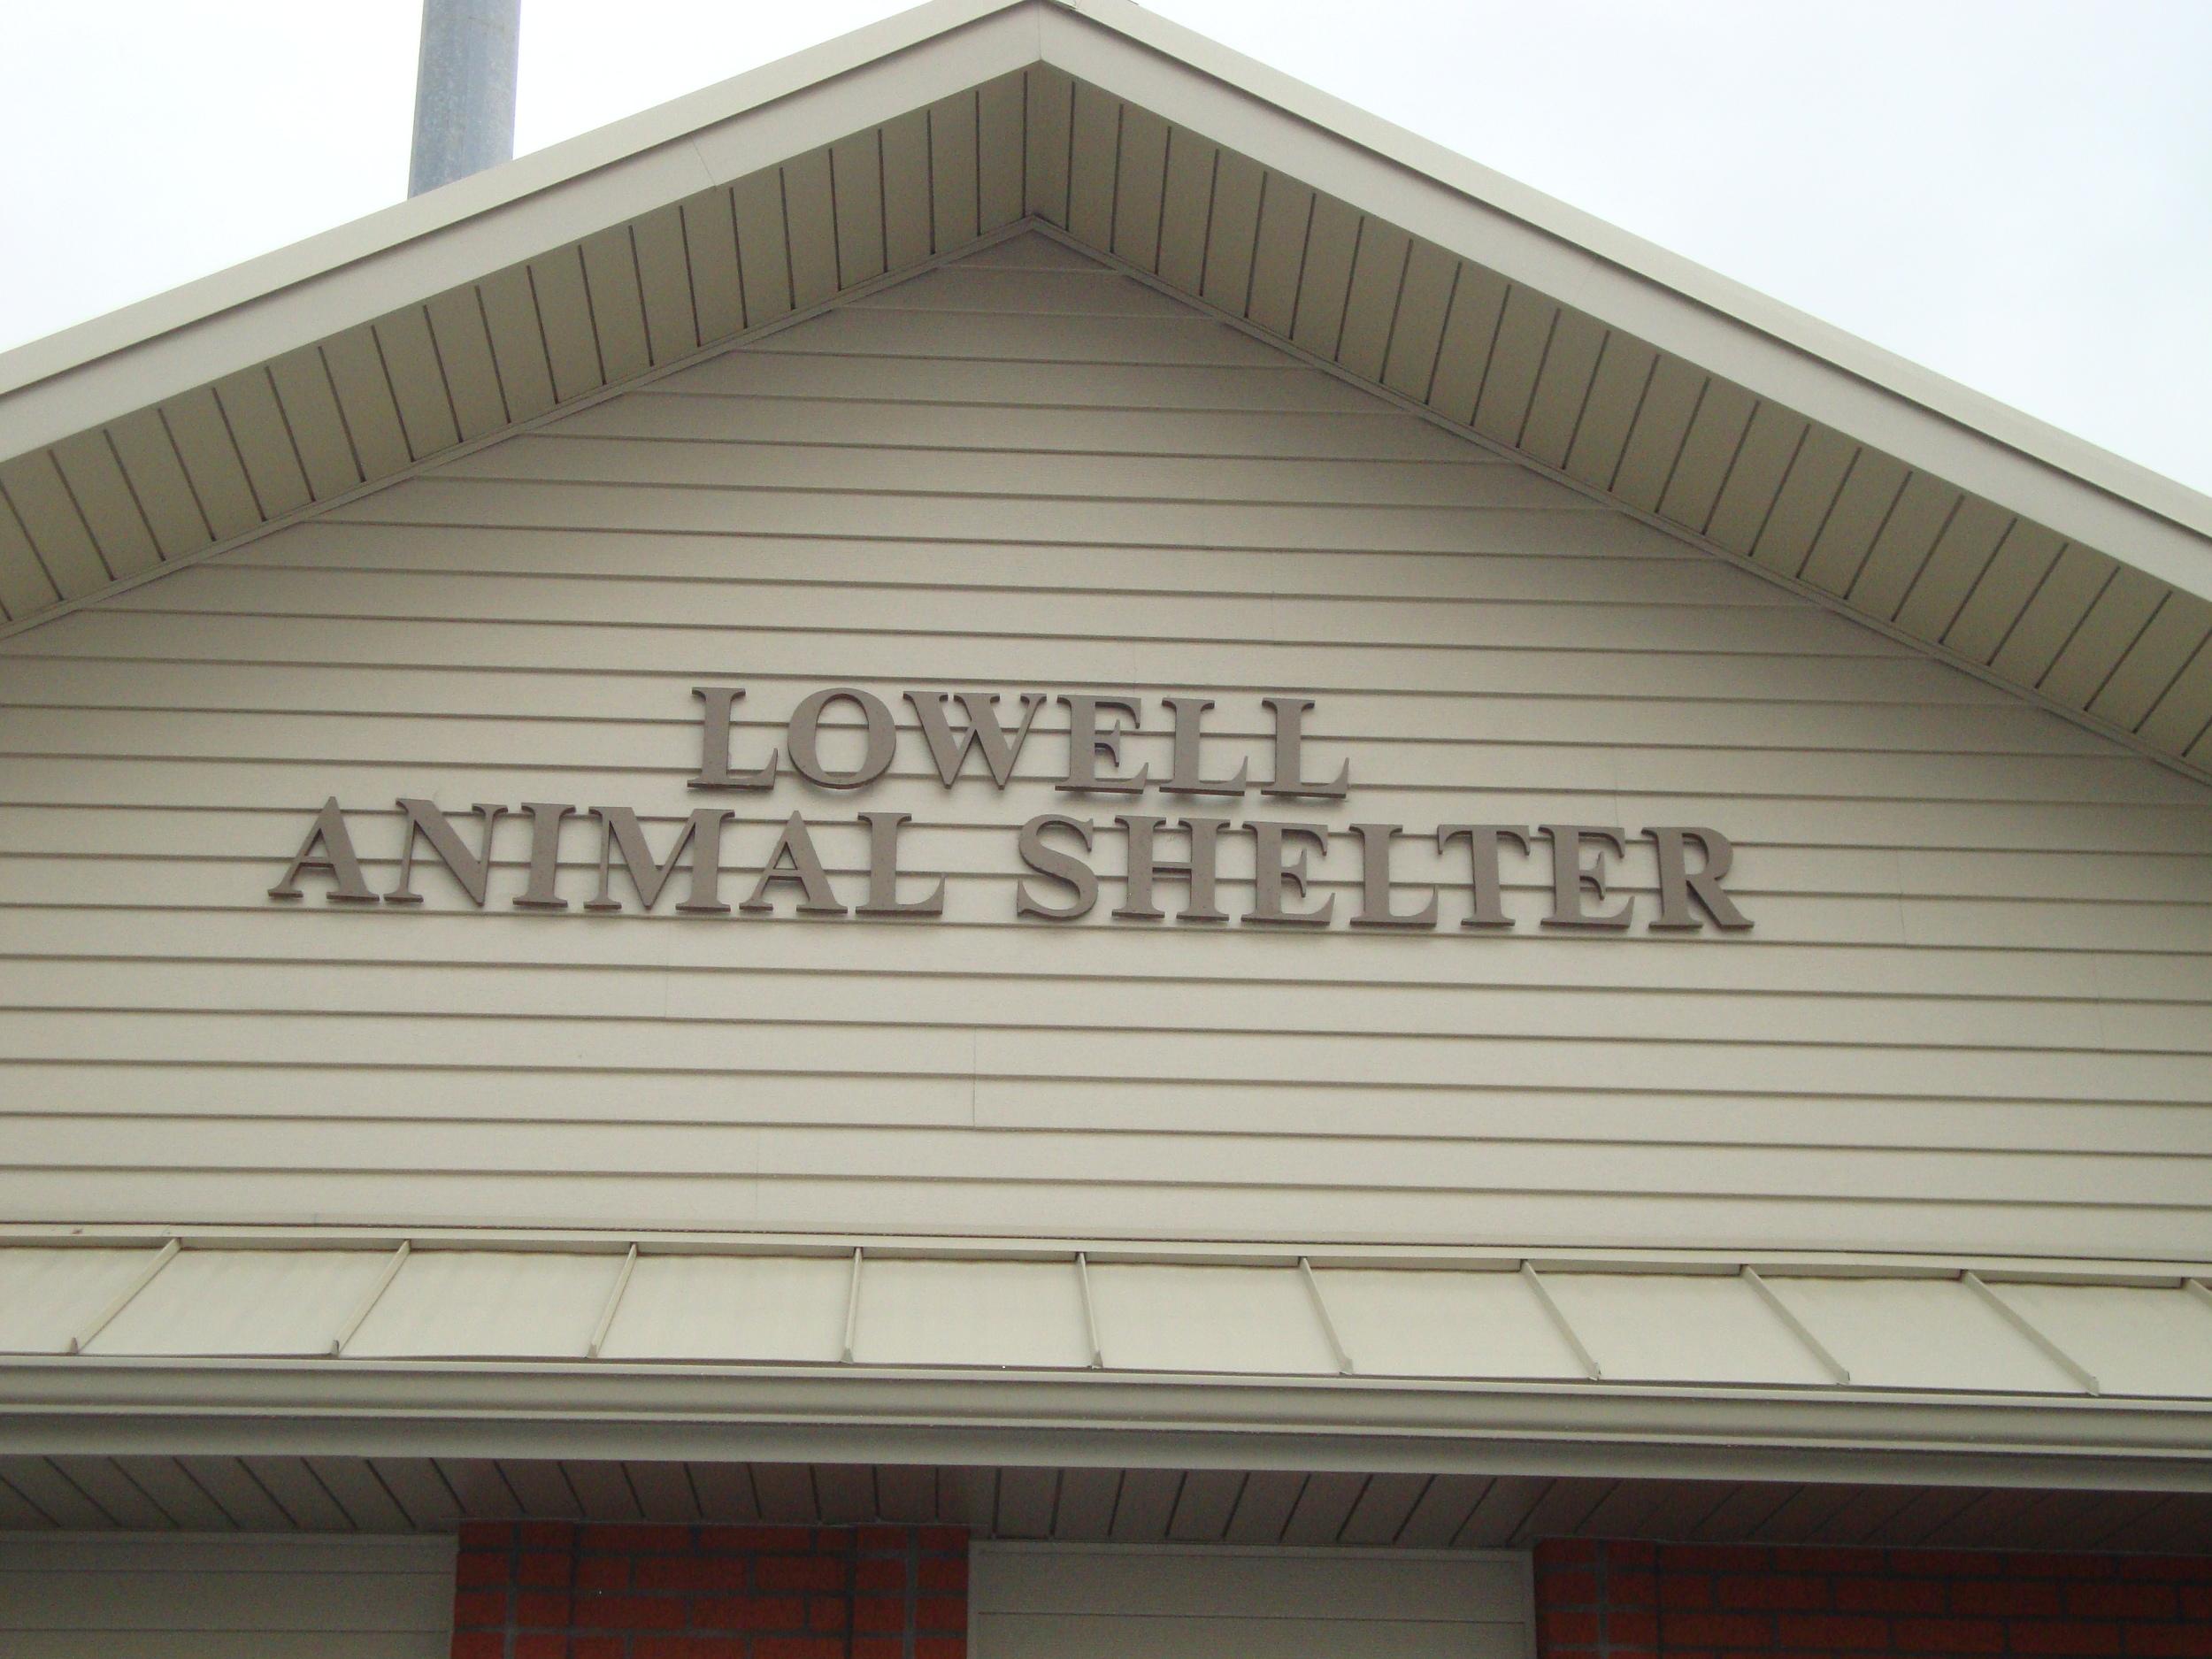 Lowell Animal Shelter